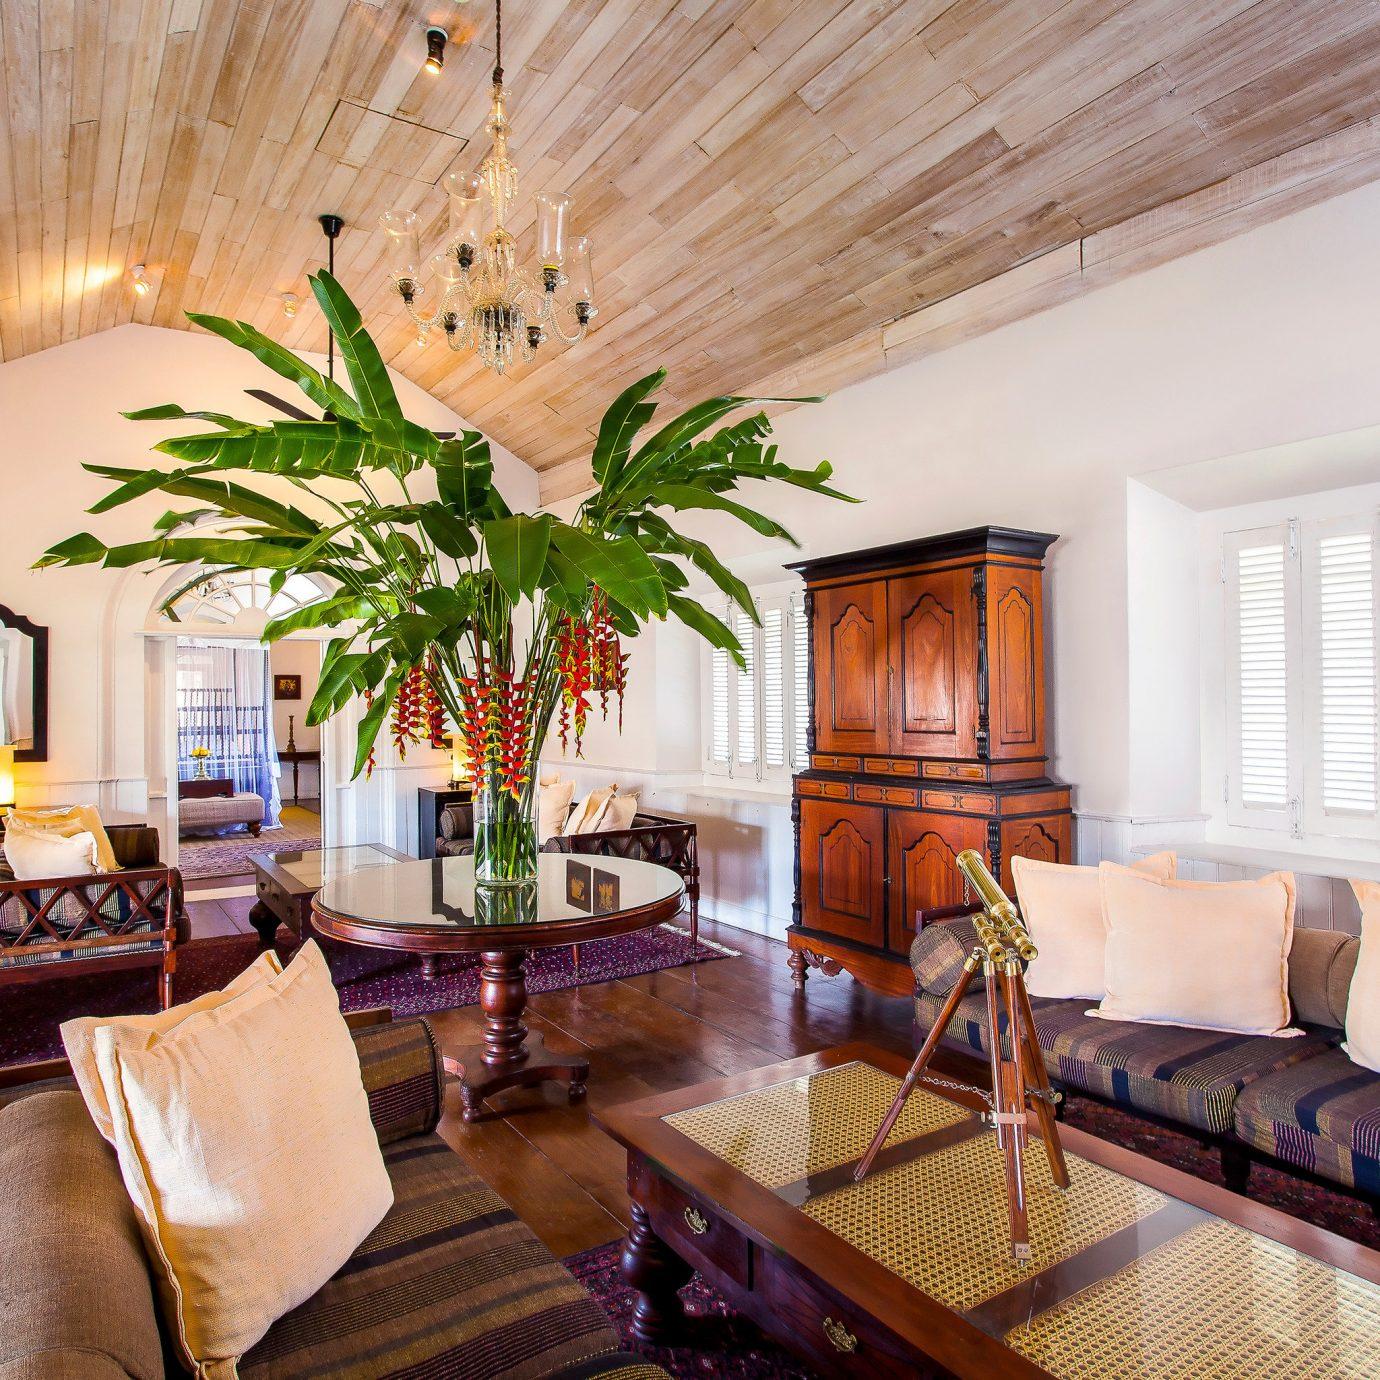 sofa property living room home condominium Resort Villa Suite cottage farmhouse mansion flat leather